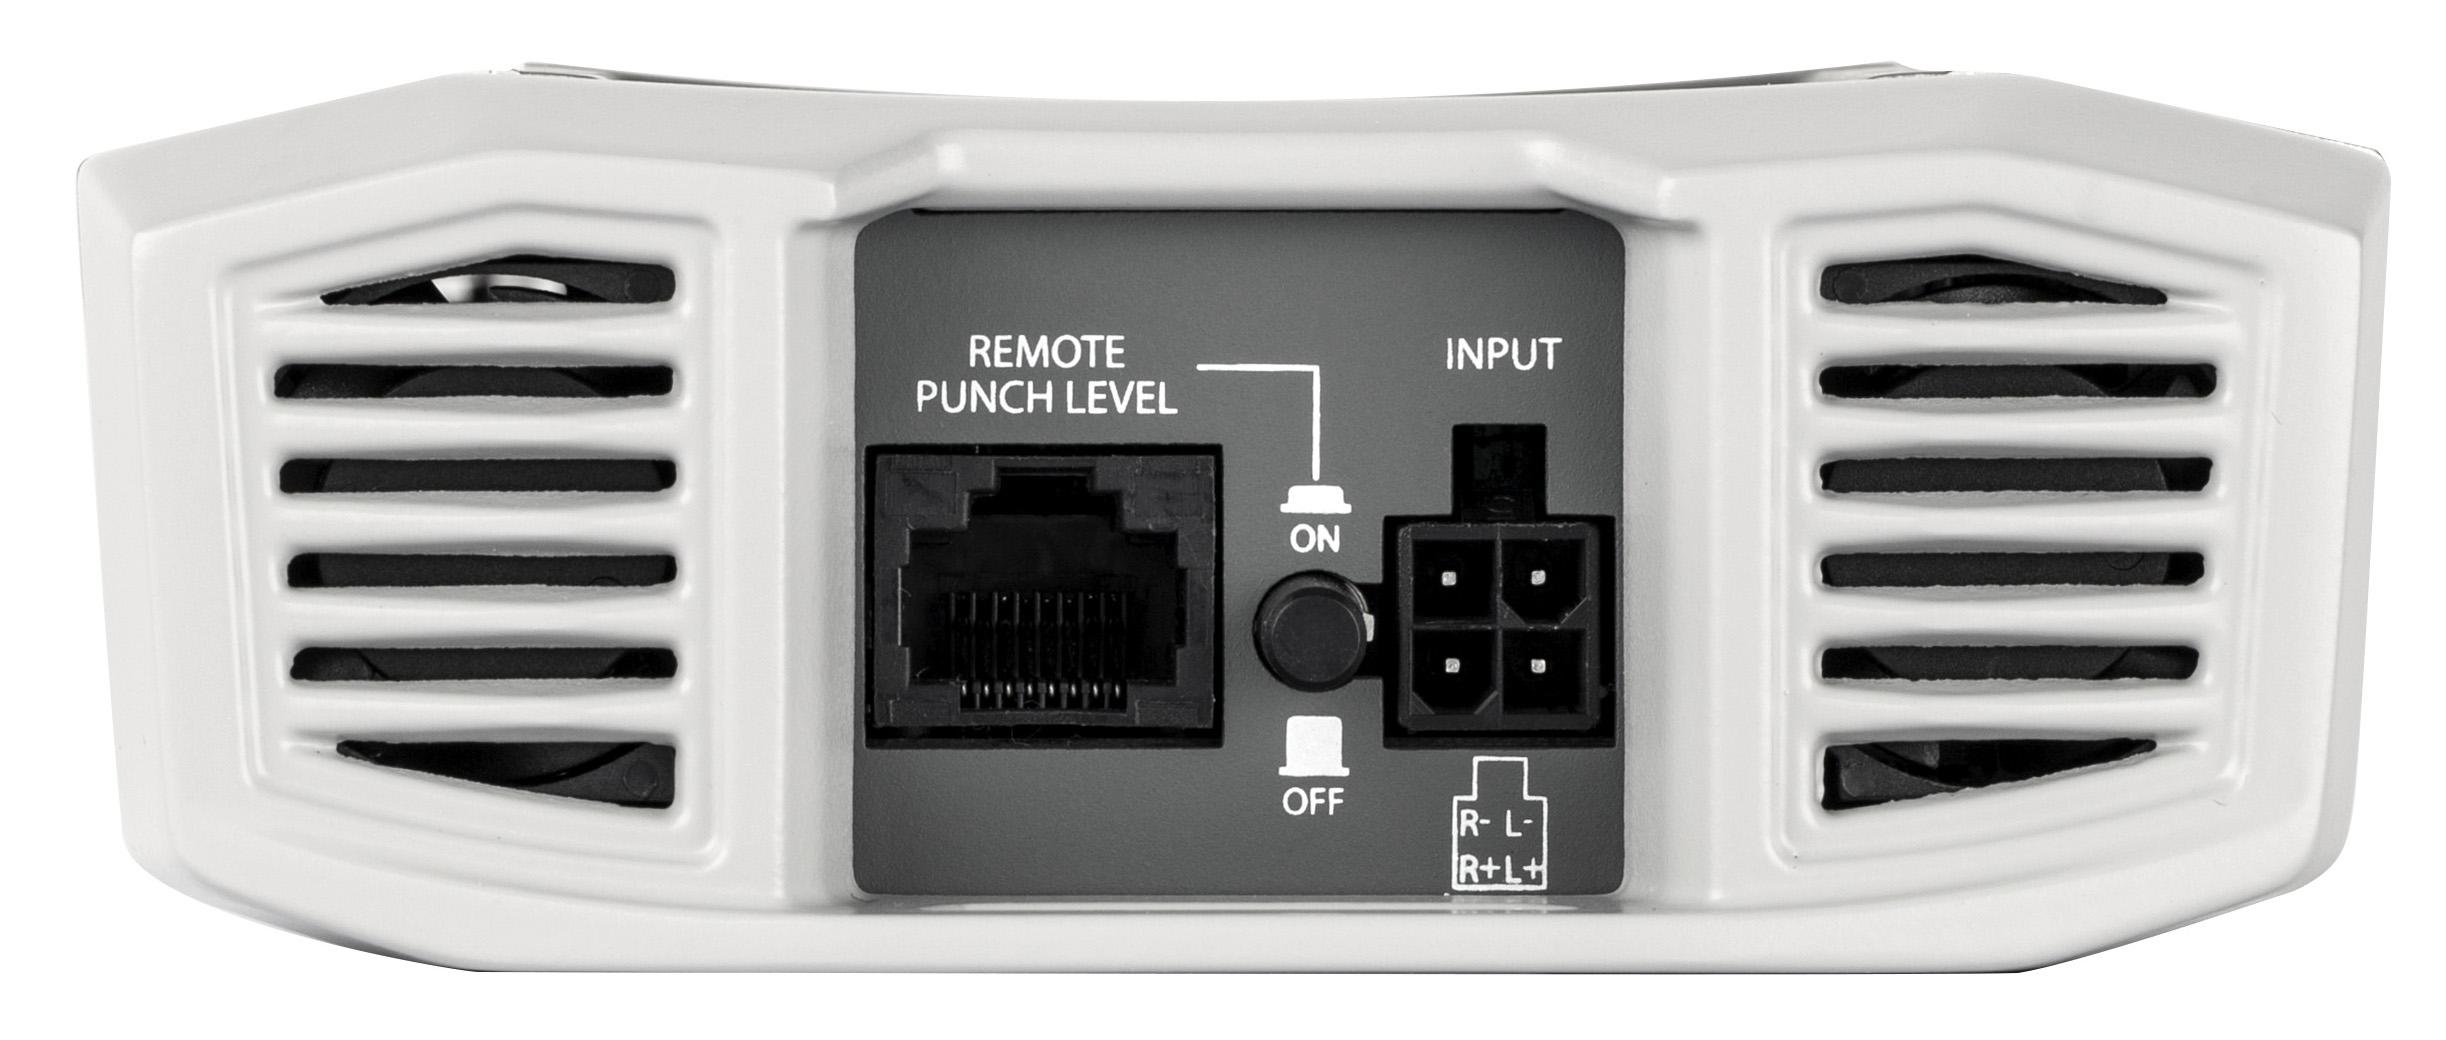 ROCKFORD FOSGATE POWER Amplifier TM500x1 BR Monoblock Endstufe Analog